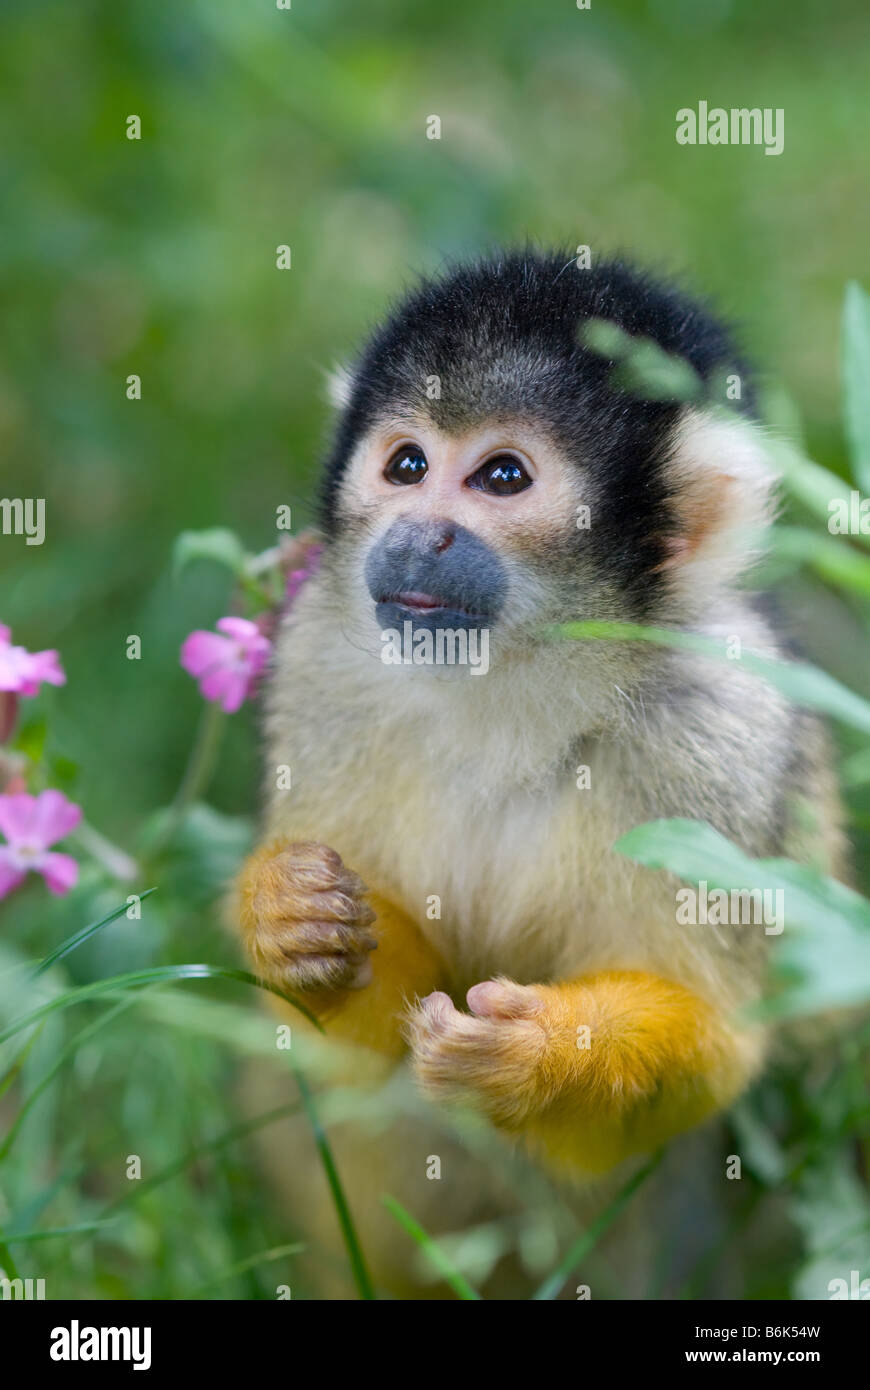 cute squirrel monkey Saimiri subfamily saimiriinae Stock Photo